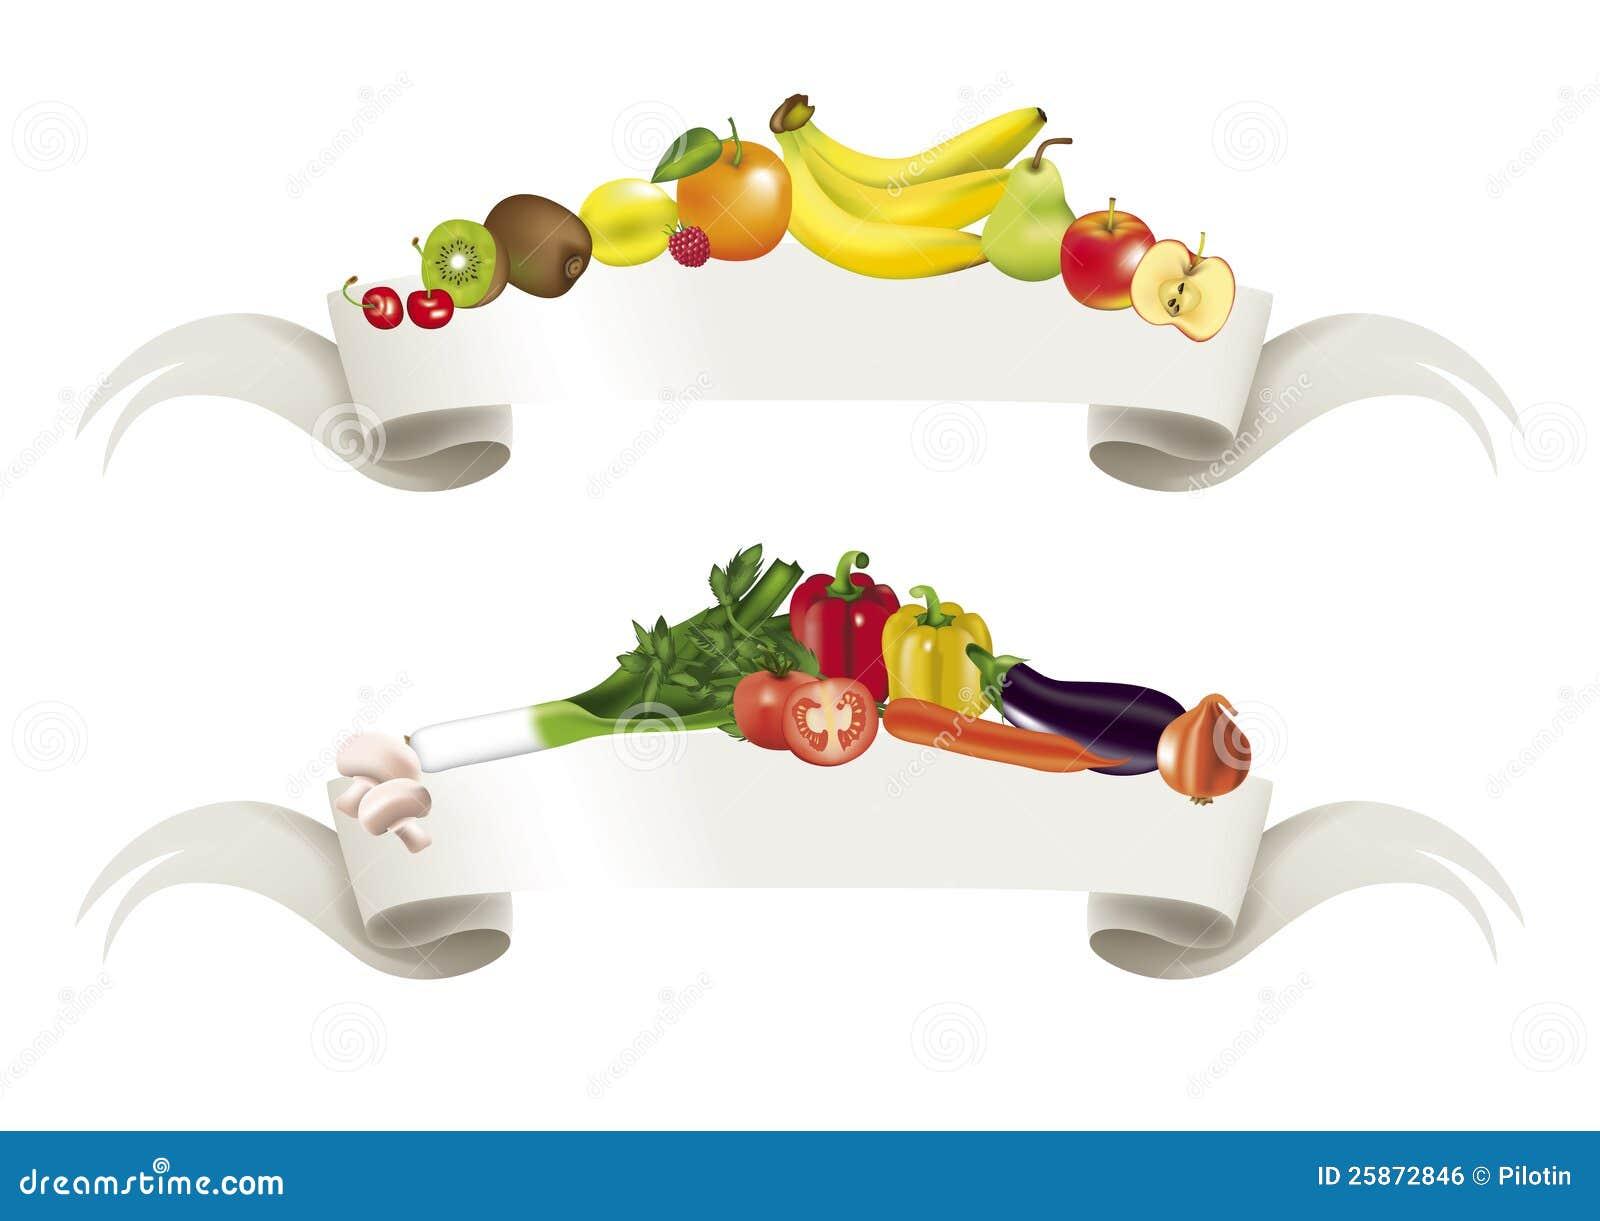 Vegetables Fruits Banner Royalty Free Stock Image - Image ...